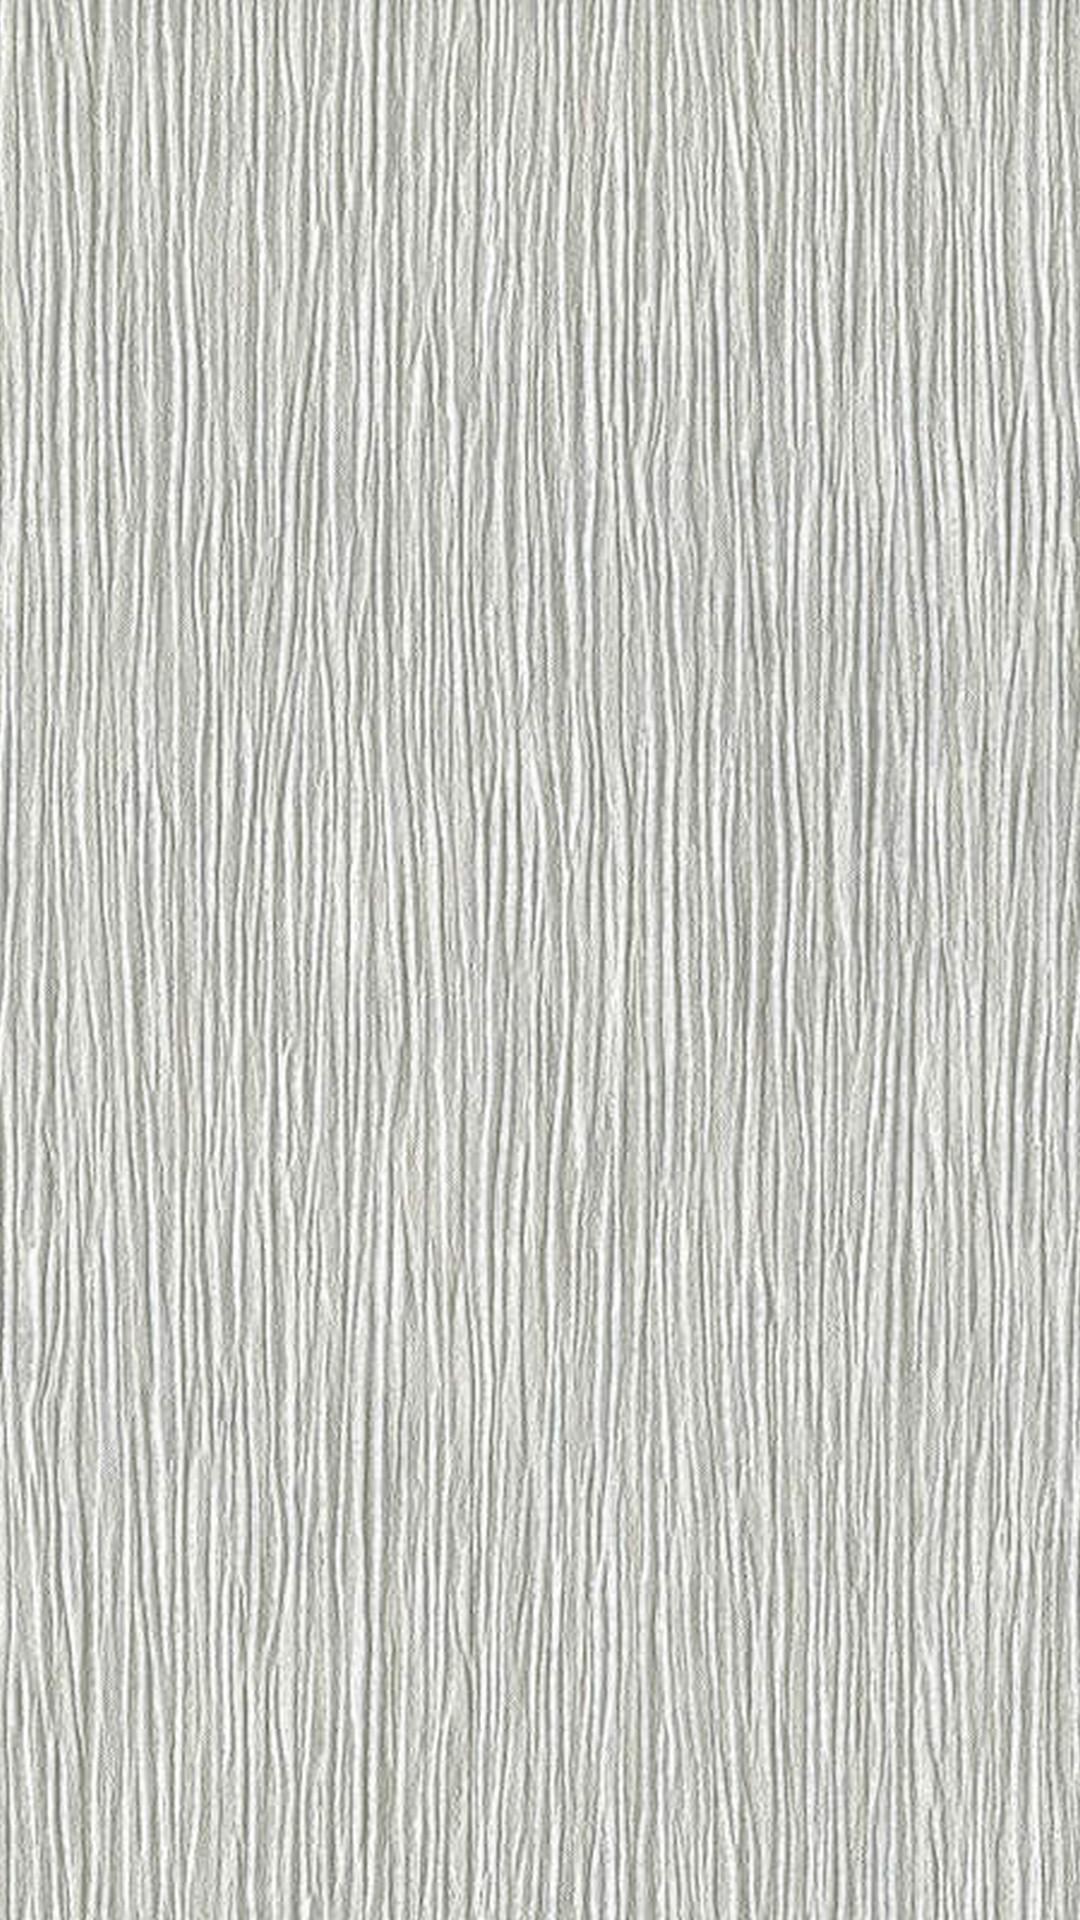 Iphone X Wallpaper Silver